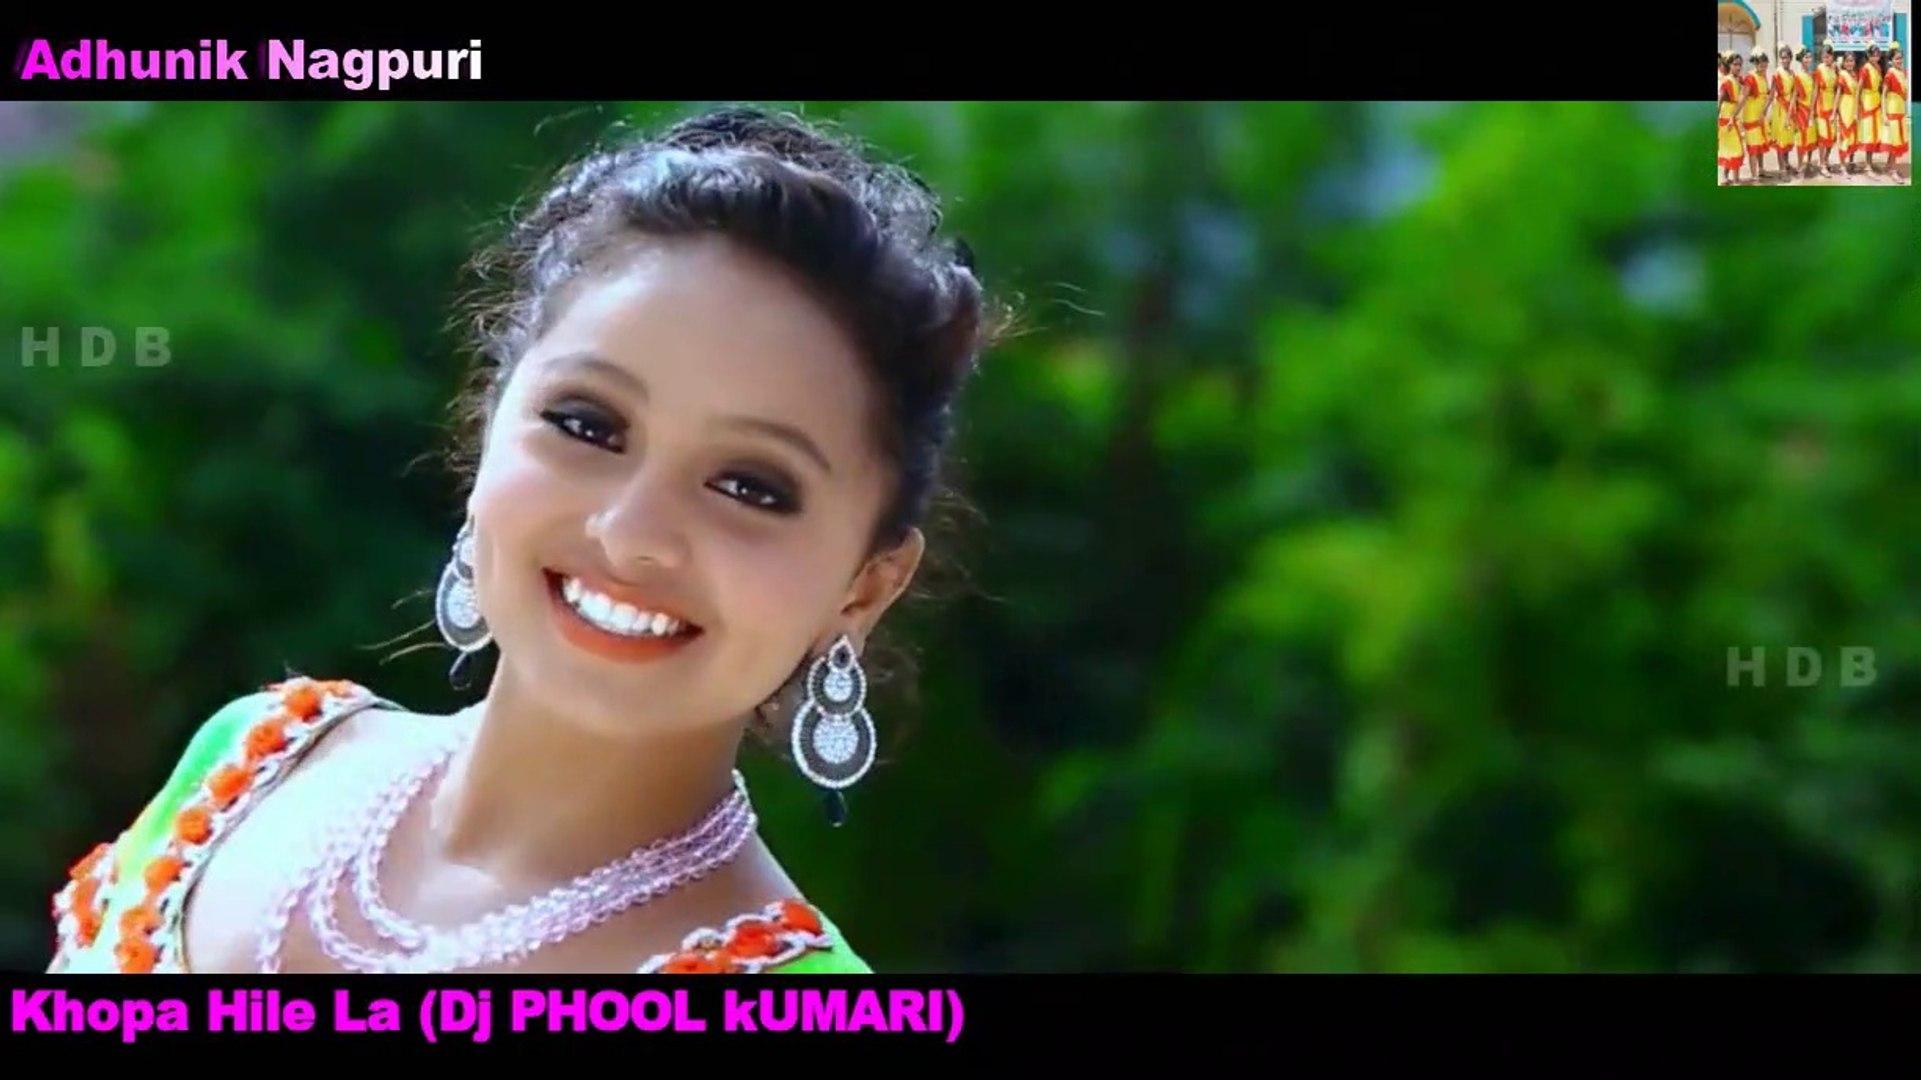 Khopa Hile La Phool Kumari( Dj Remix) - Adhunik Nagpuri